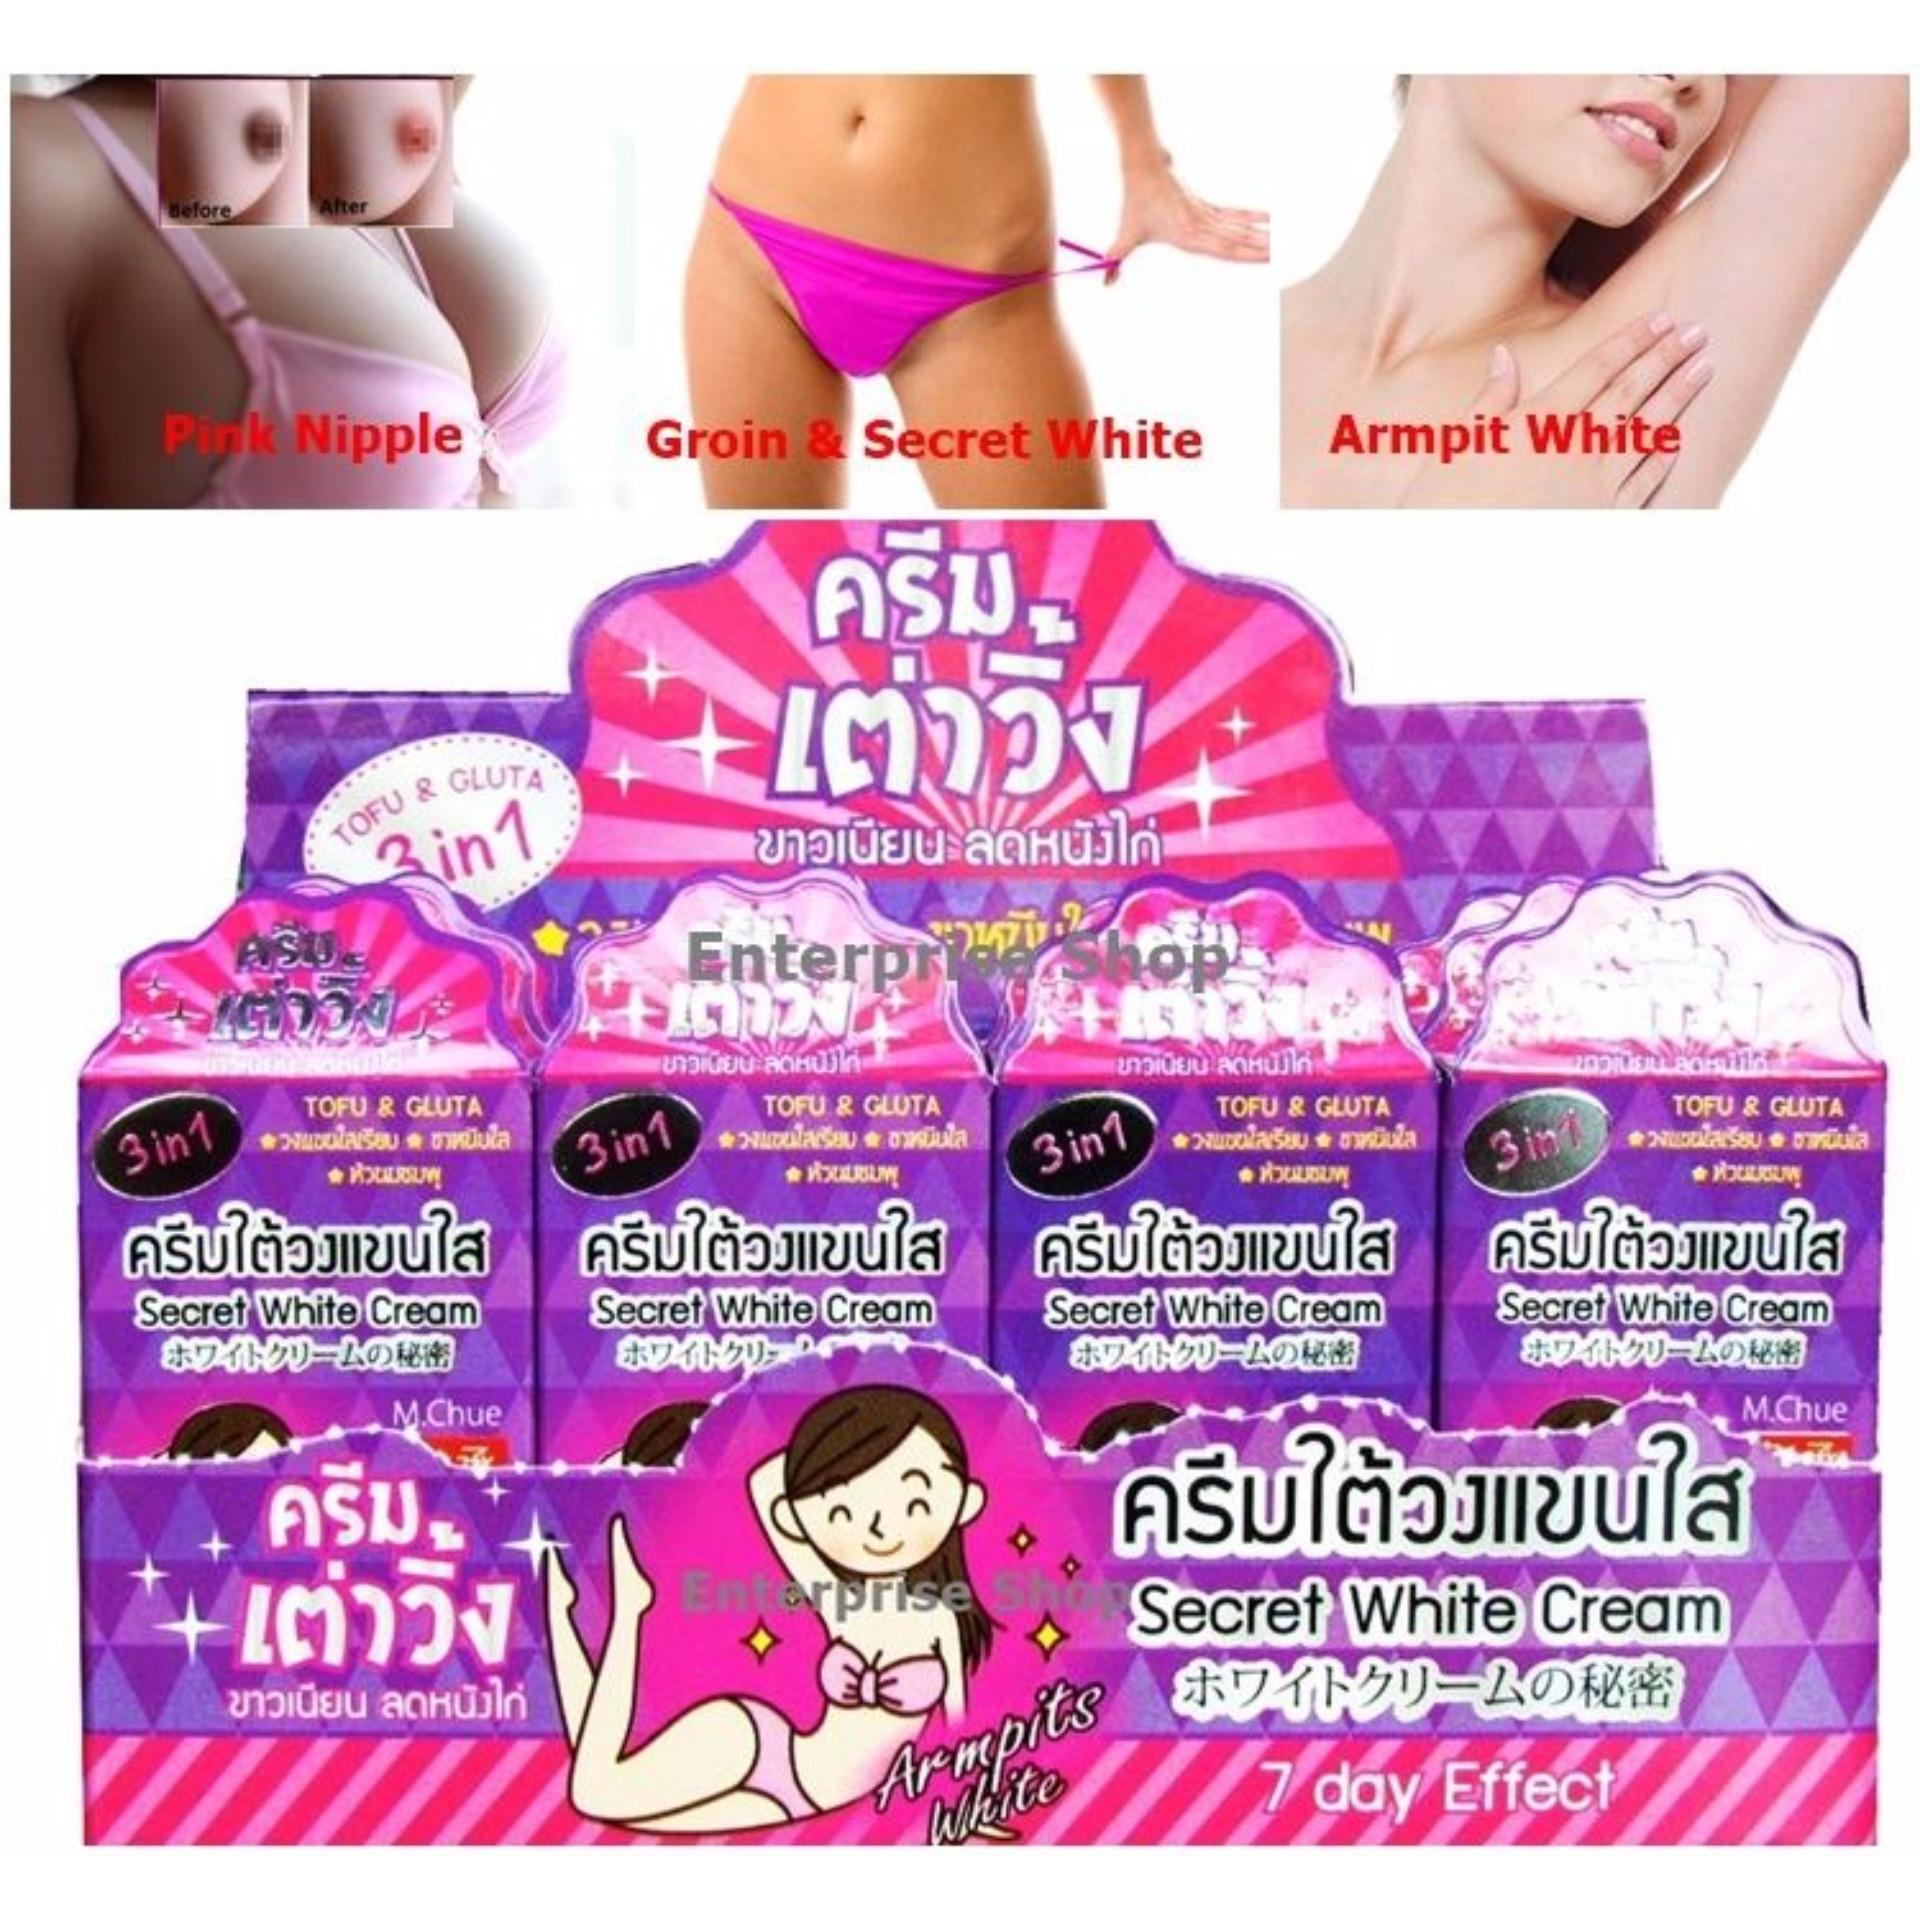 Bộ 2 Kem Trị Thâm Nách, Bikini, Nhũ Hoa 3in1 MCHUE SECRET WHITE CREAM